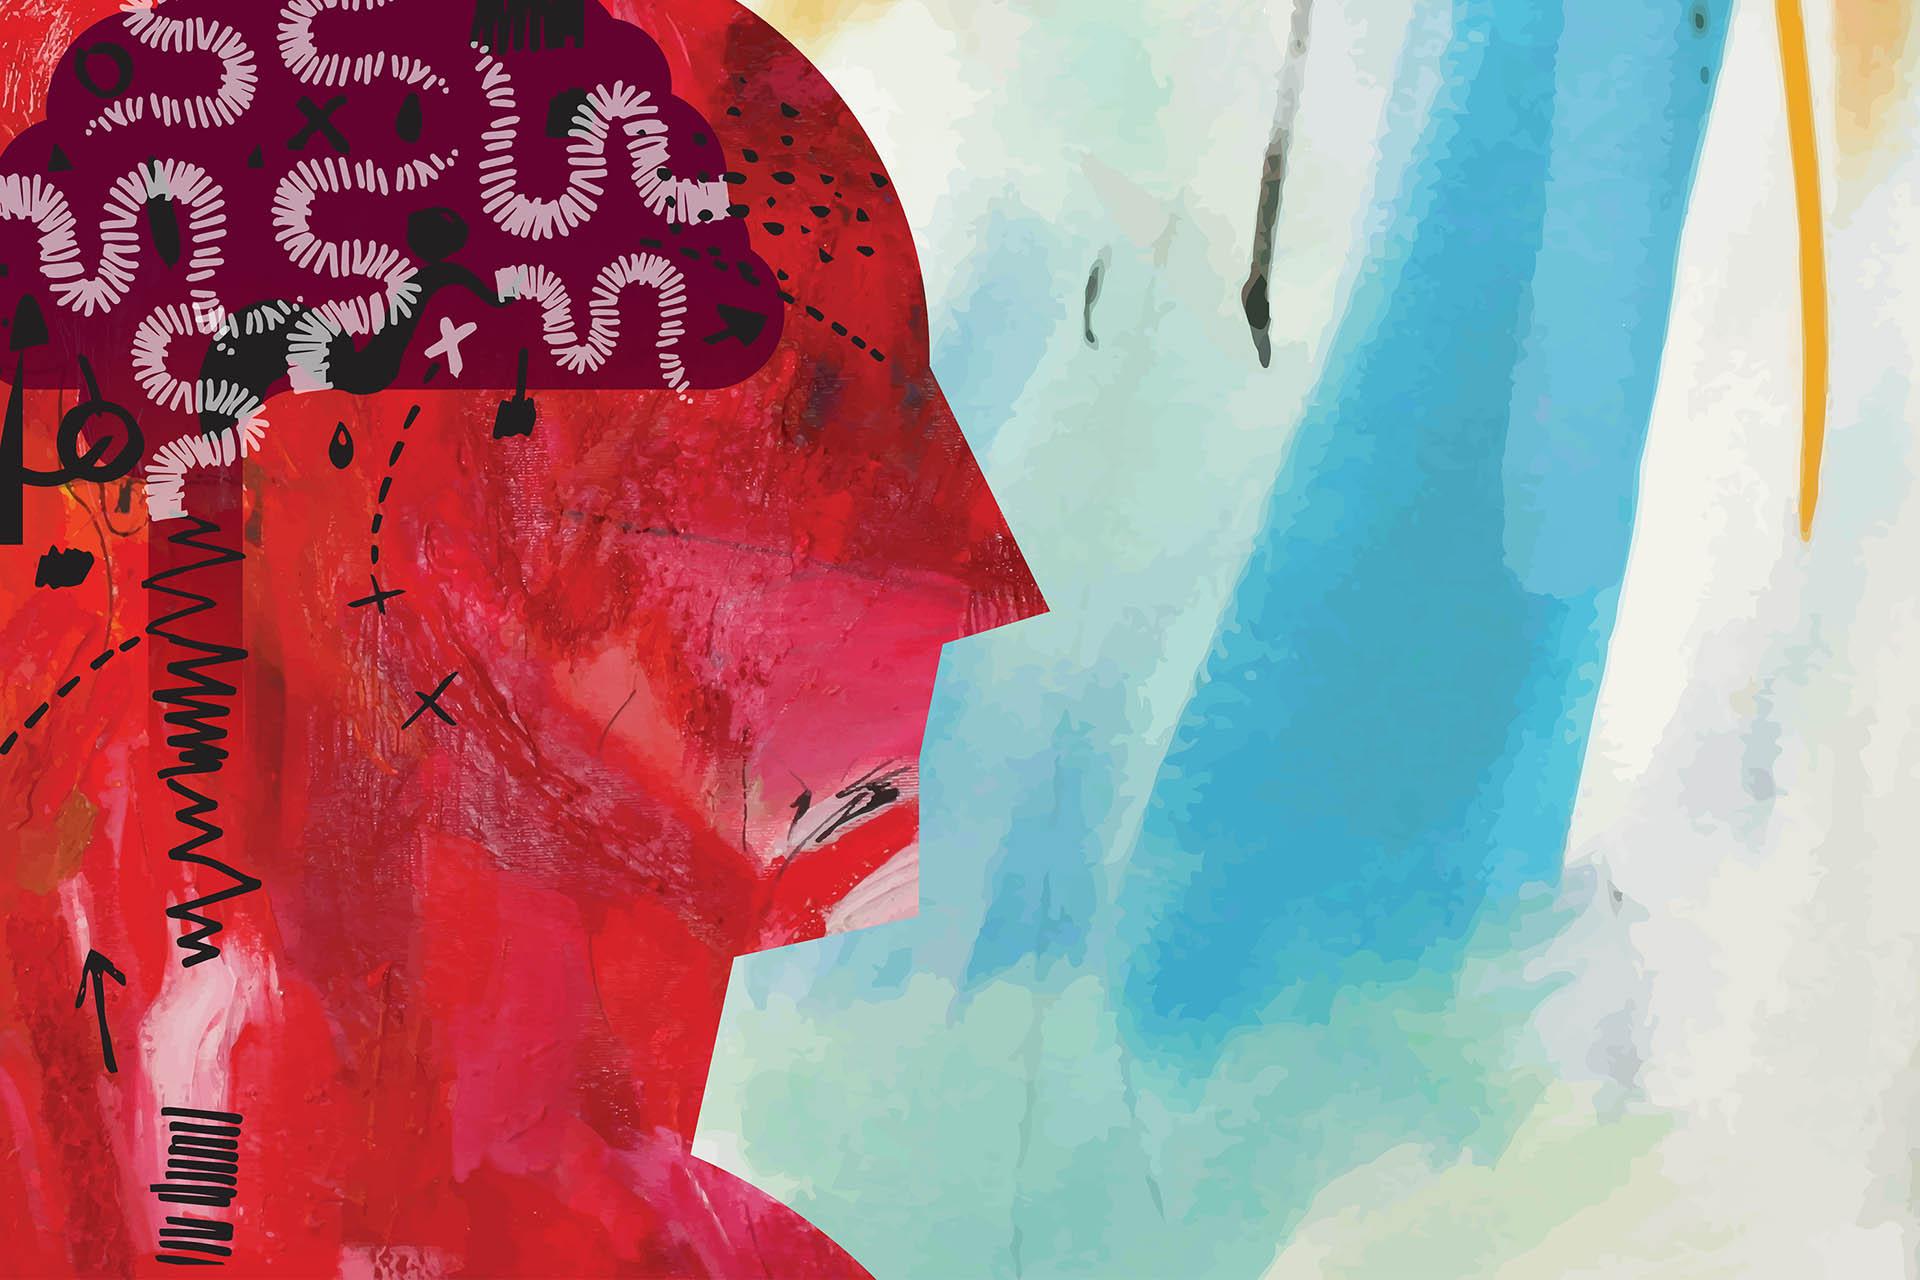 Cognitive Psychology Neuropsychology Phd Postgraduate Course University Of Kent Dissertation Topics Topic